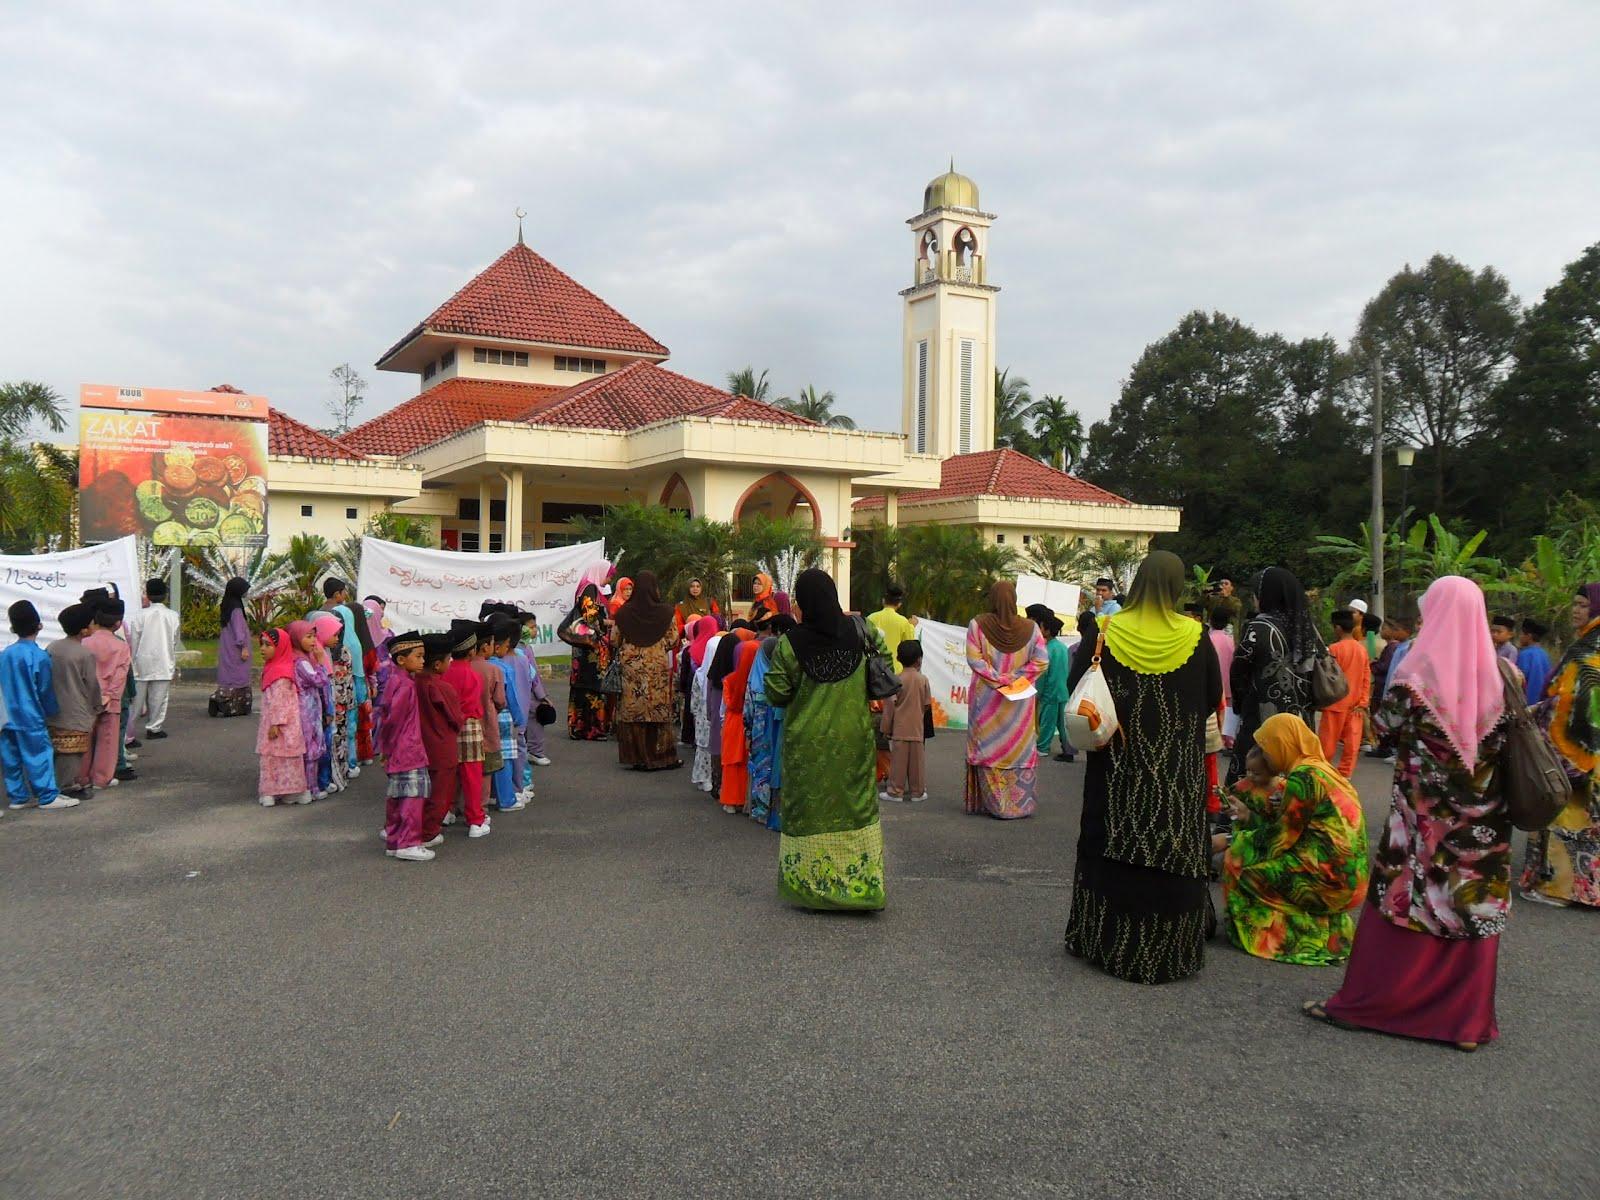 Sk Binjai Kertas,21700-Kuala Berang,Terengganu